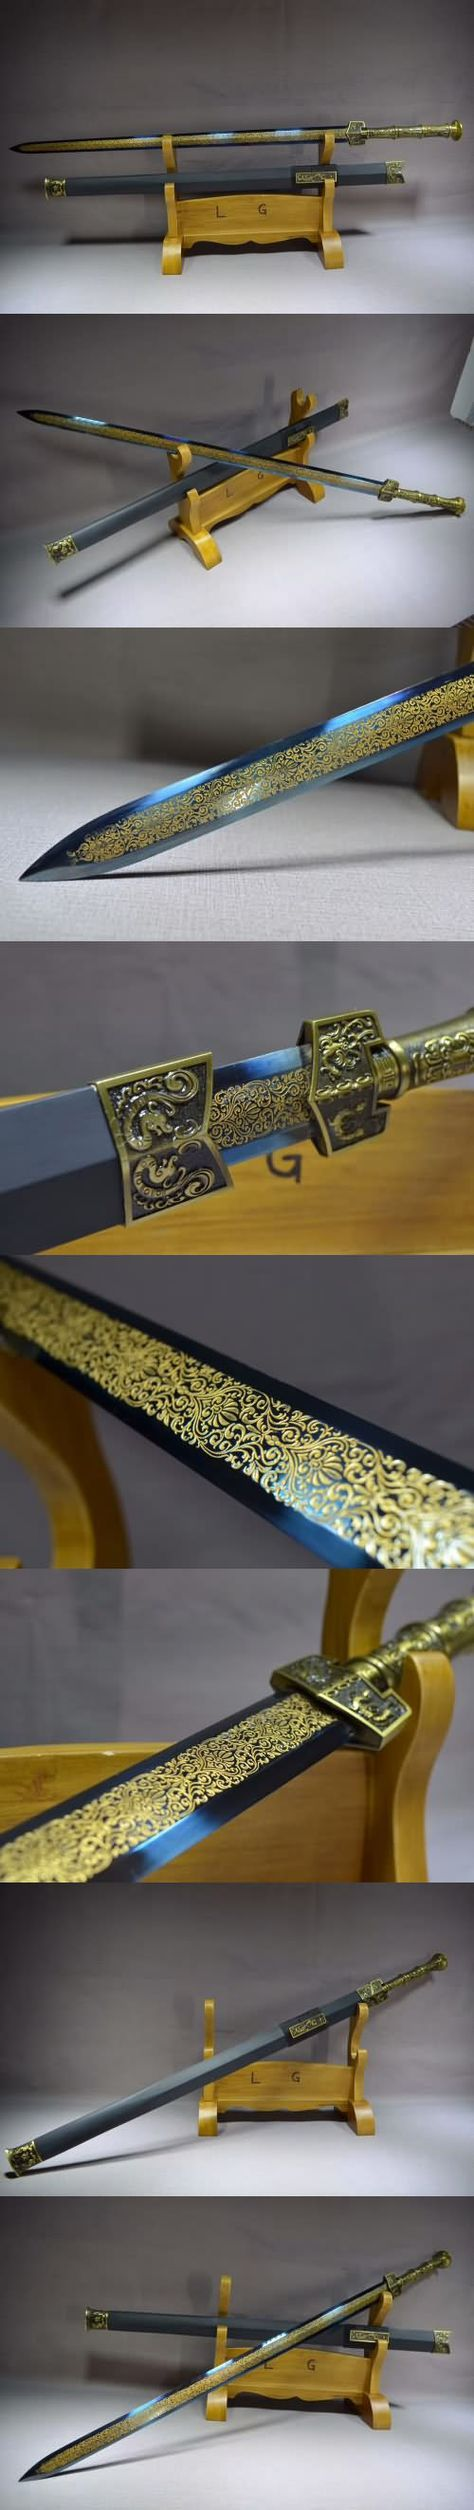 https://www.chinese-sword.com